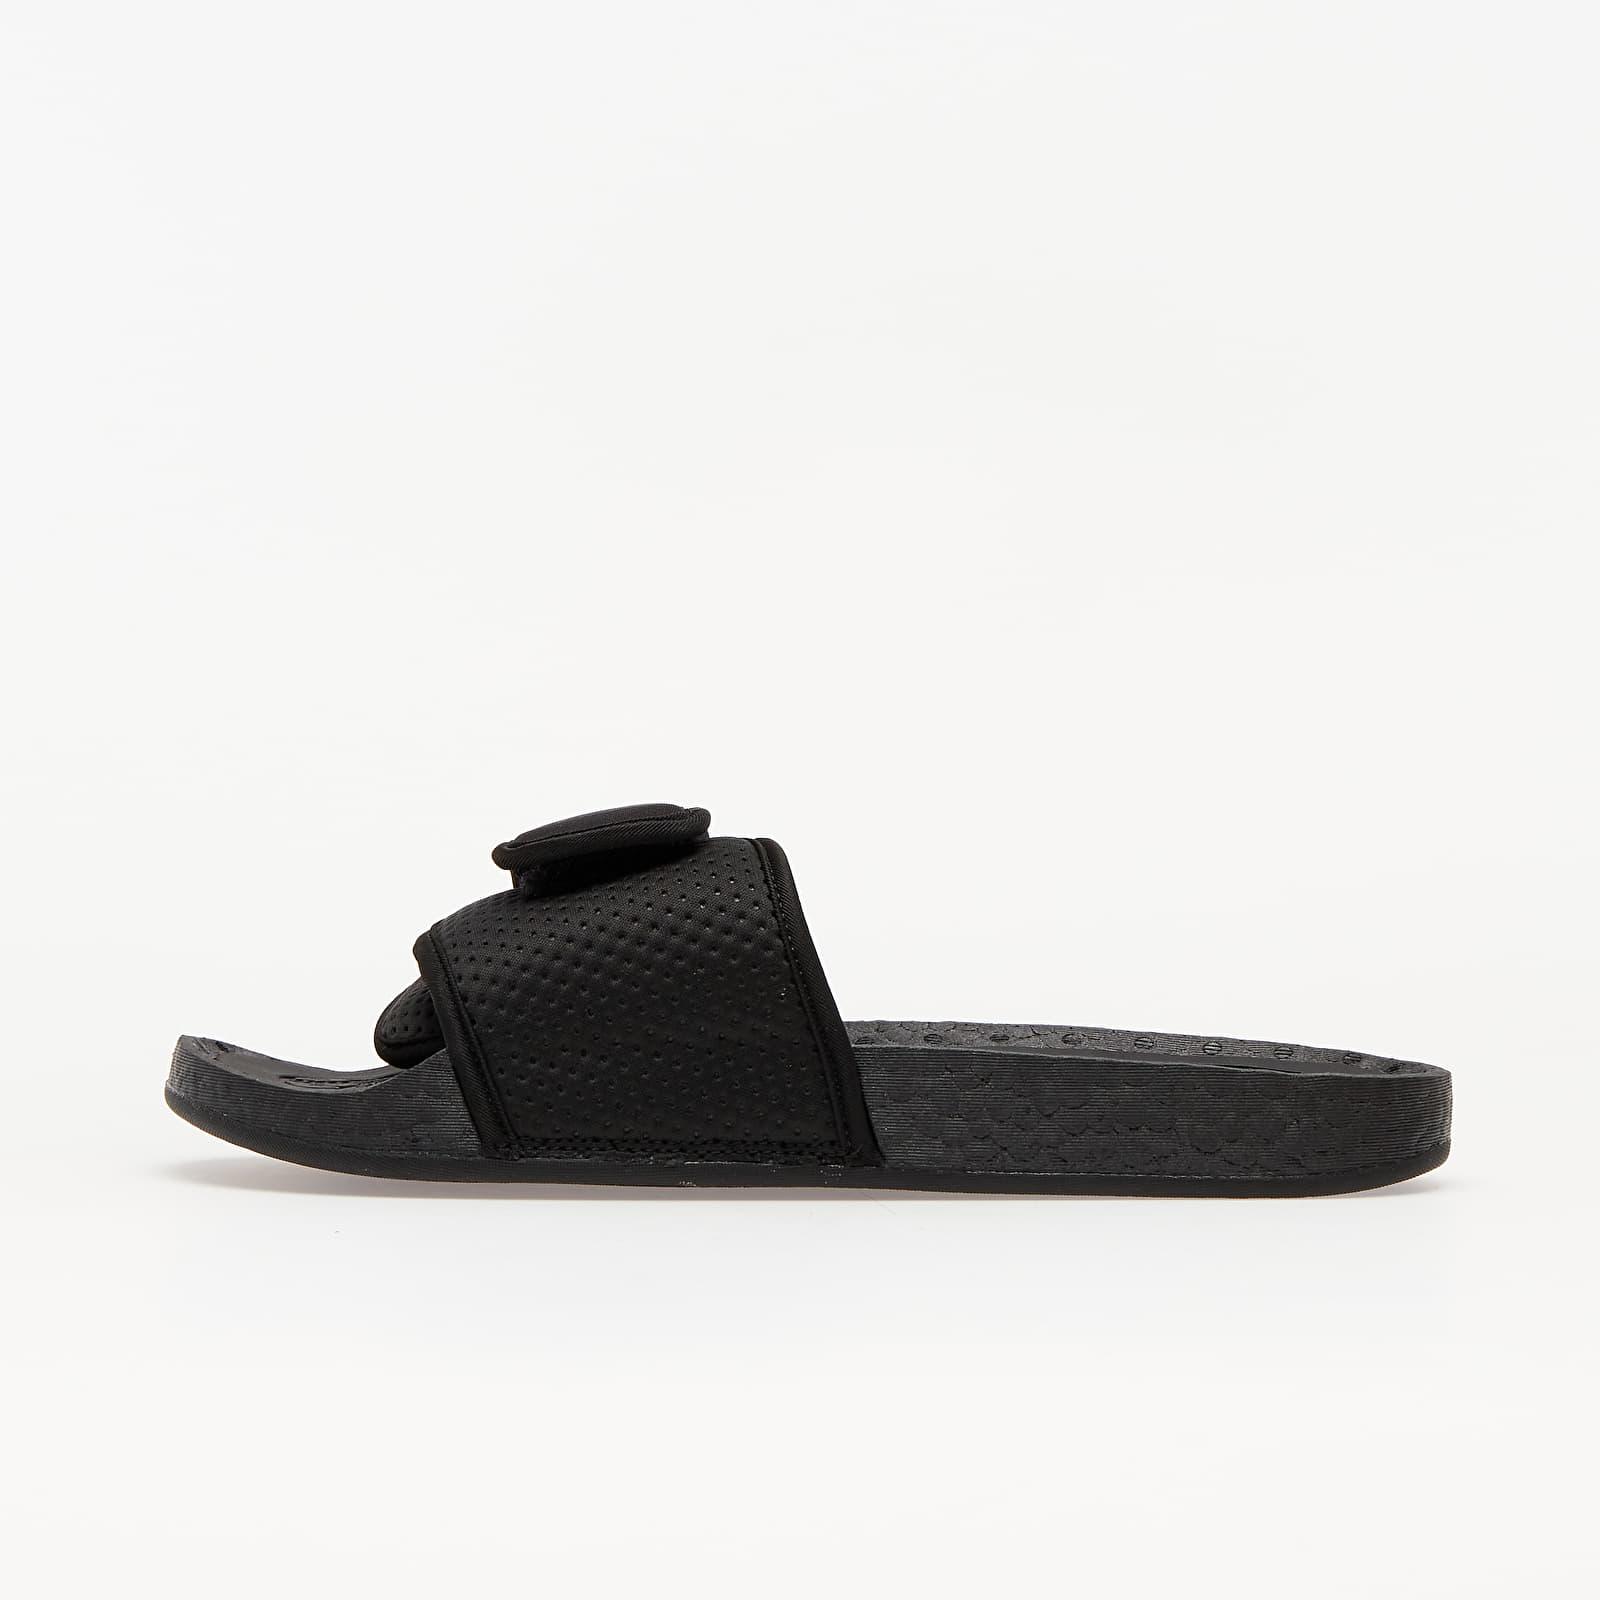 adidas x Pharrell Williams Chancletas HU Core Black/ Core Black/ Core Black